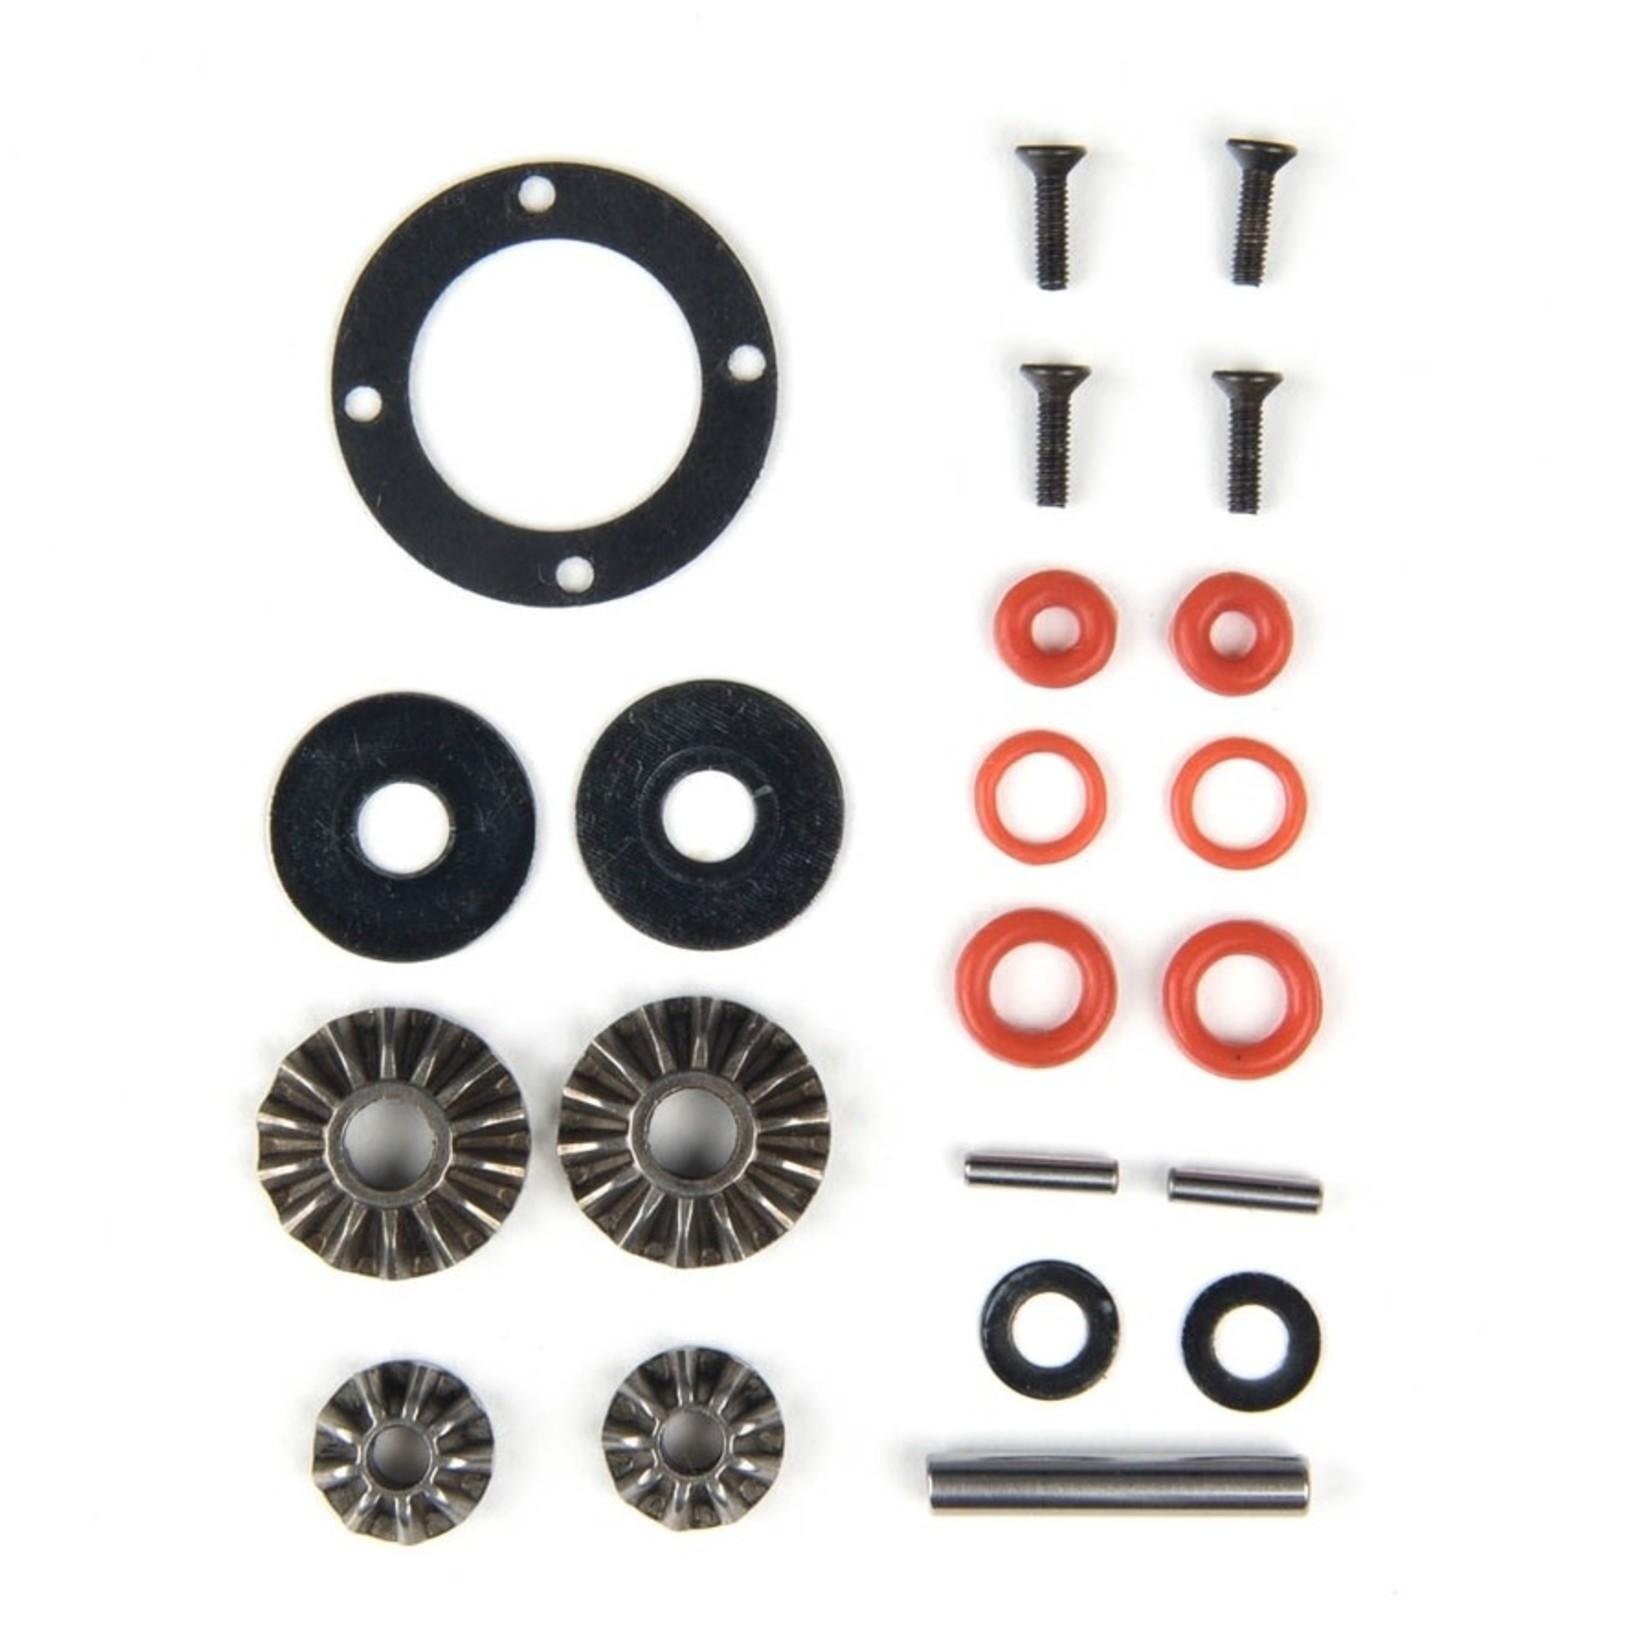 ARRMA AR310378 Arrma Diff Gear Maintenance Set